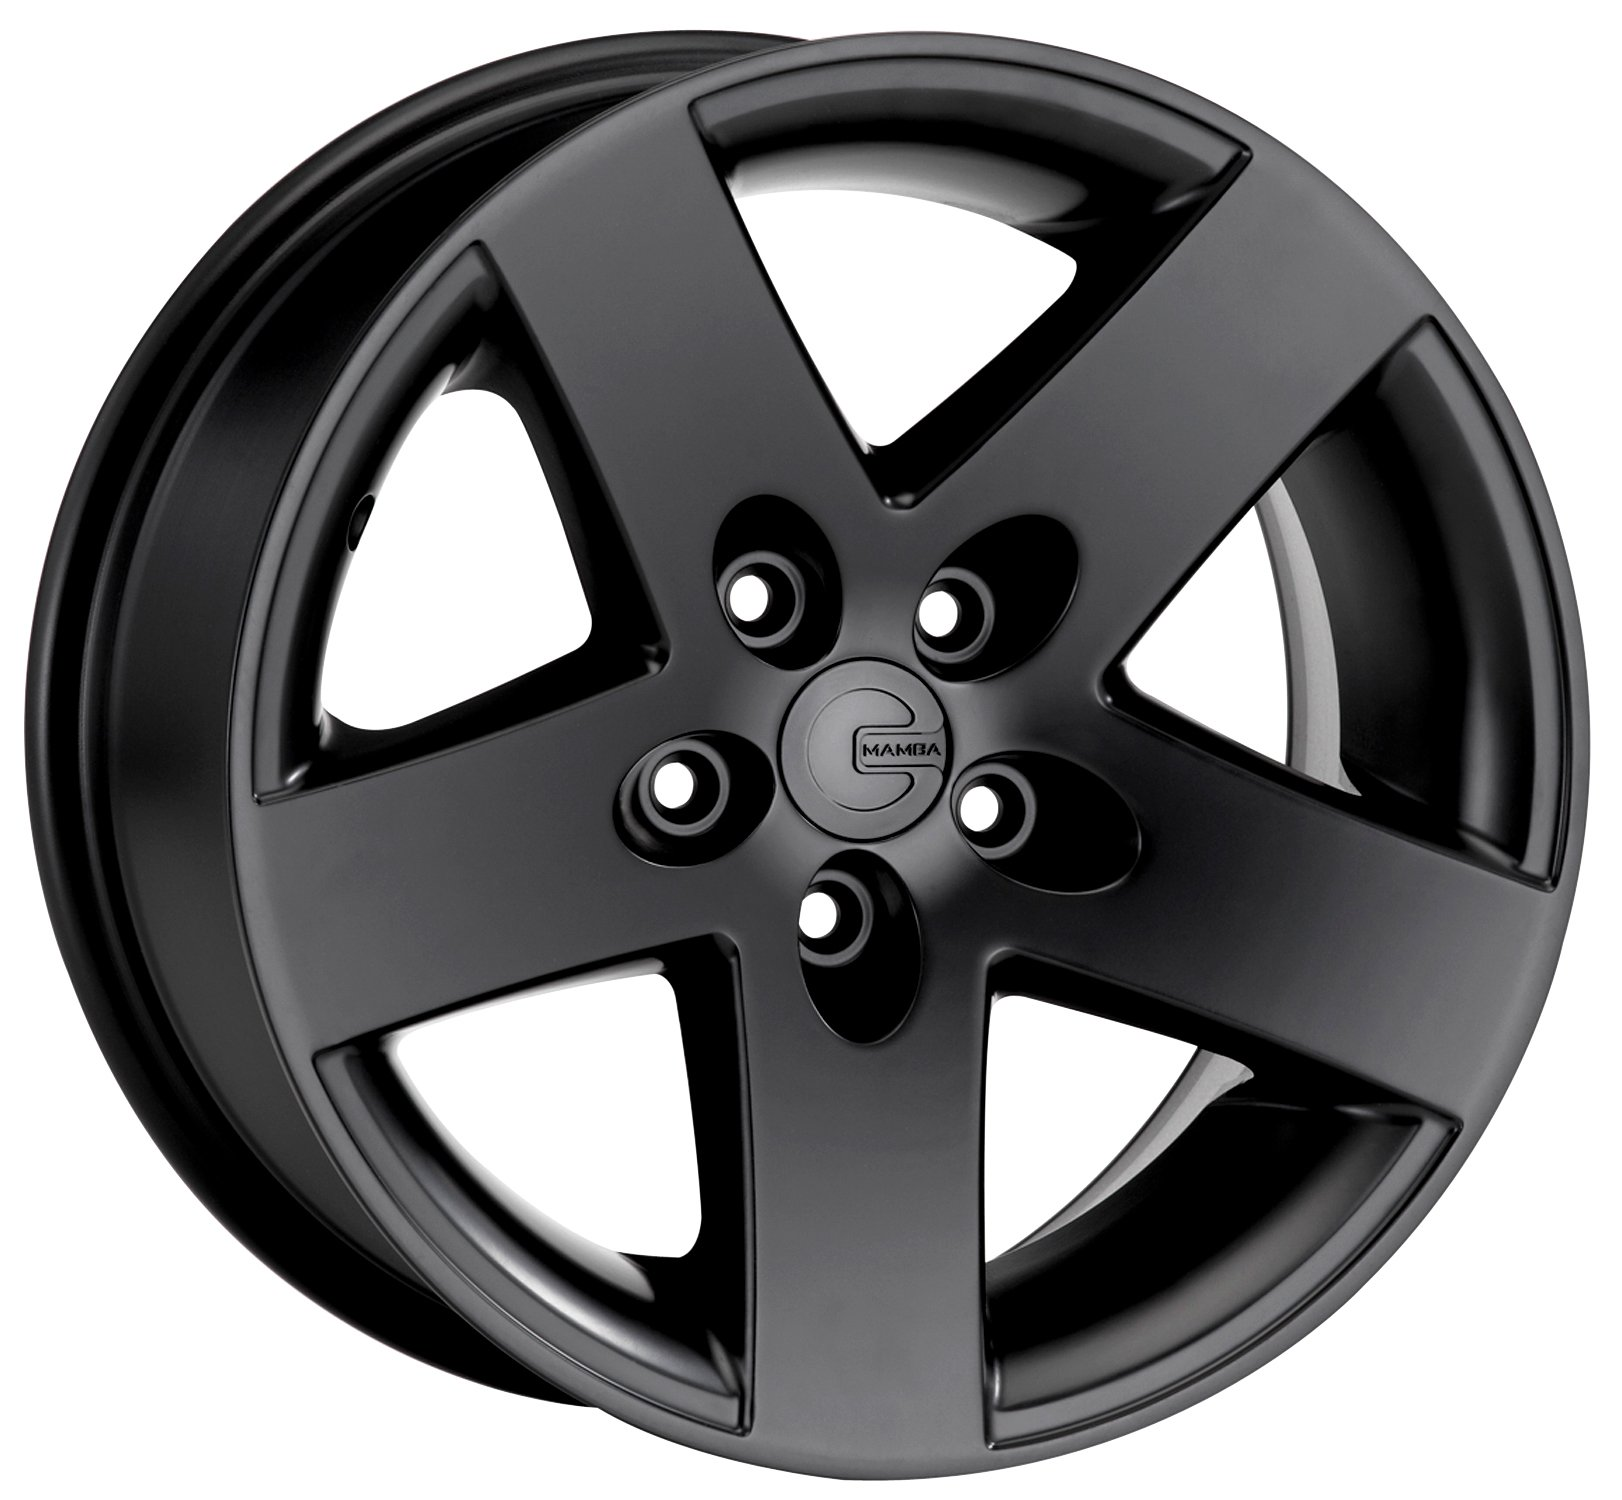 Mamba MR1X Matte Black Wheel (15x8''/5x114.3mm, 0mm offset)